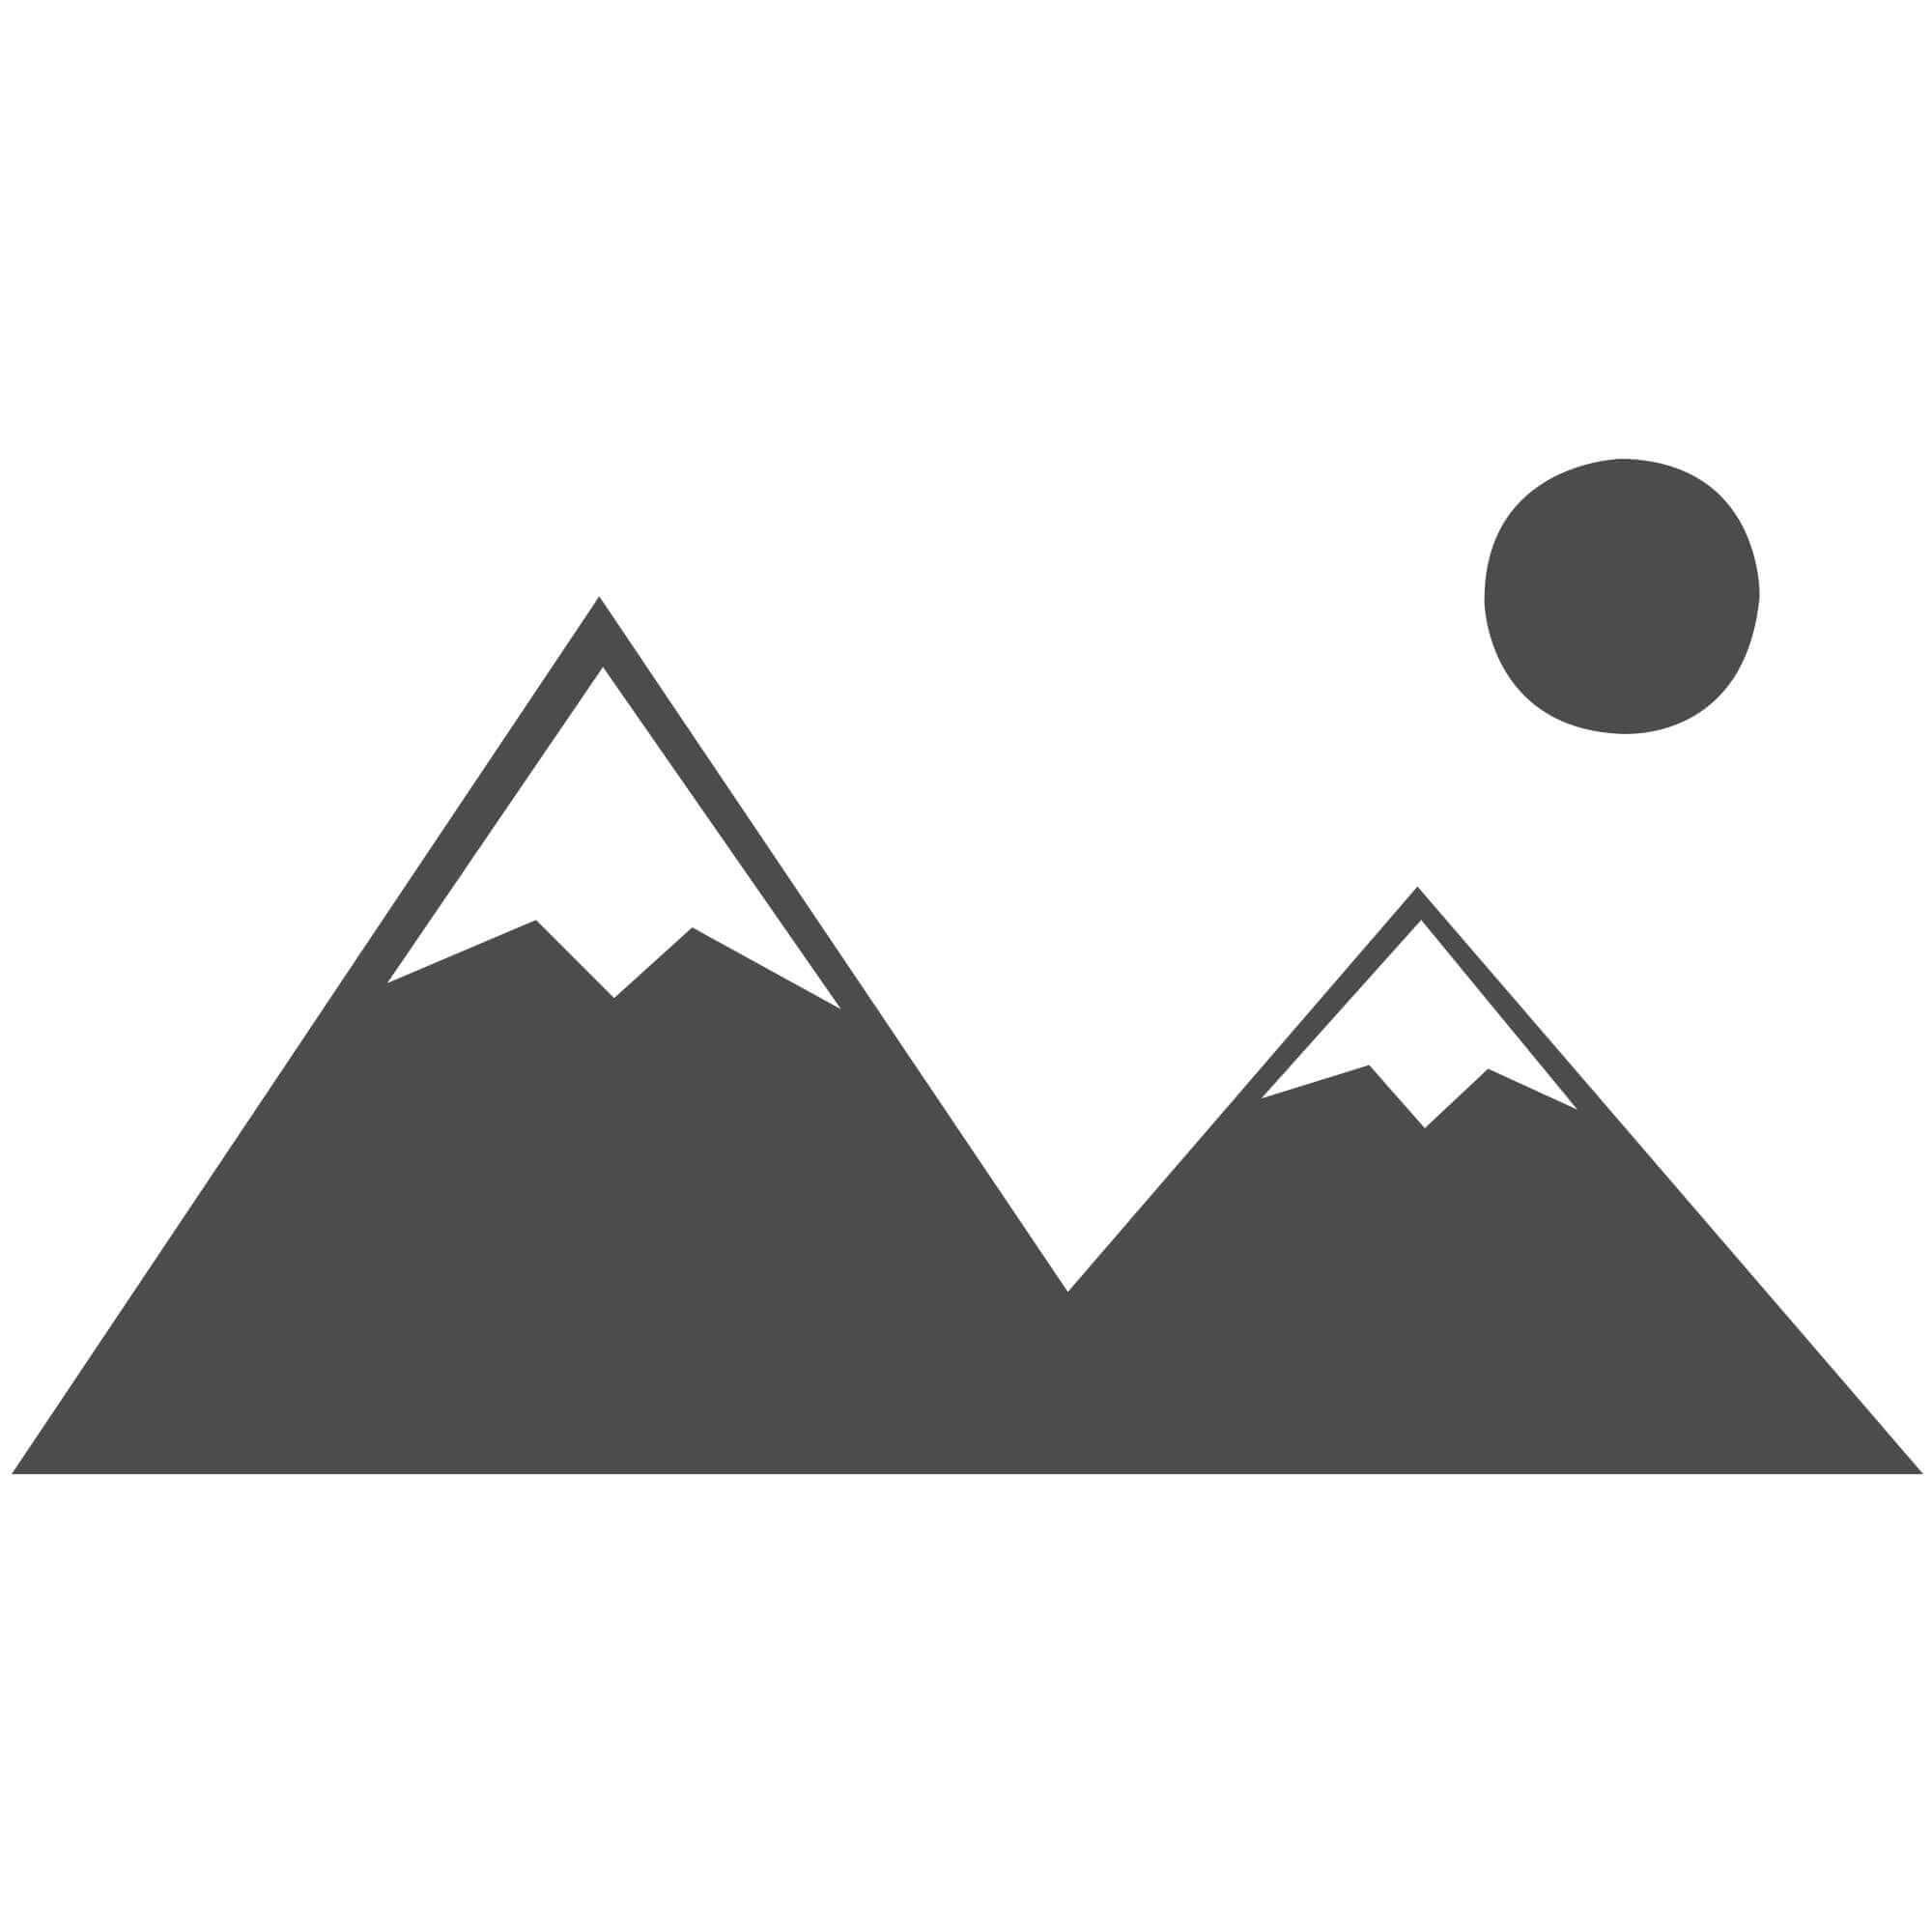 "Velvet Shaggy Rug - Natural - Size 120 x 170 cm (4' x 5'7"")"